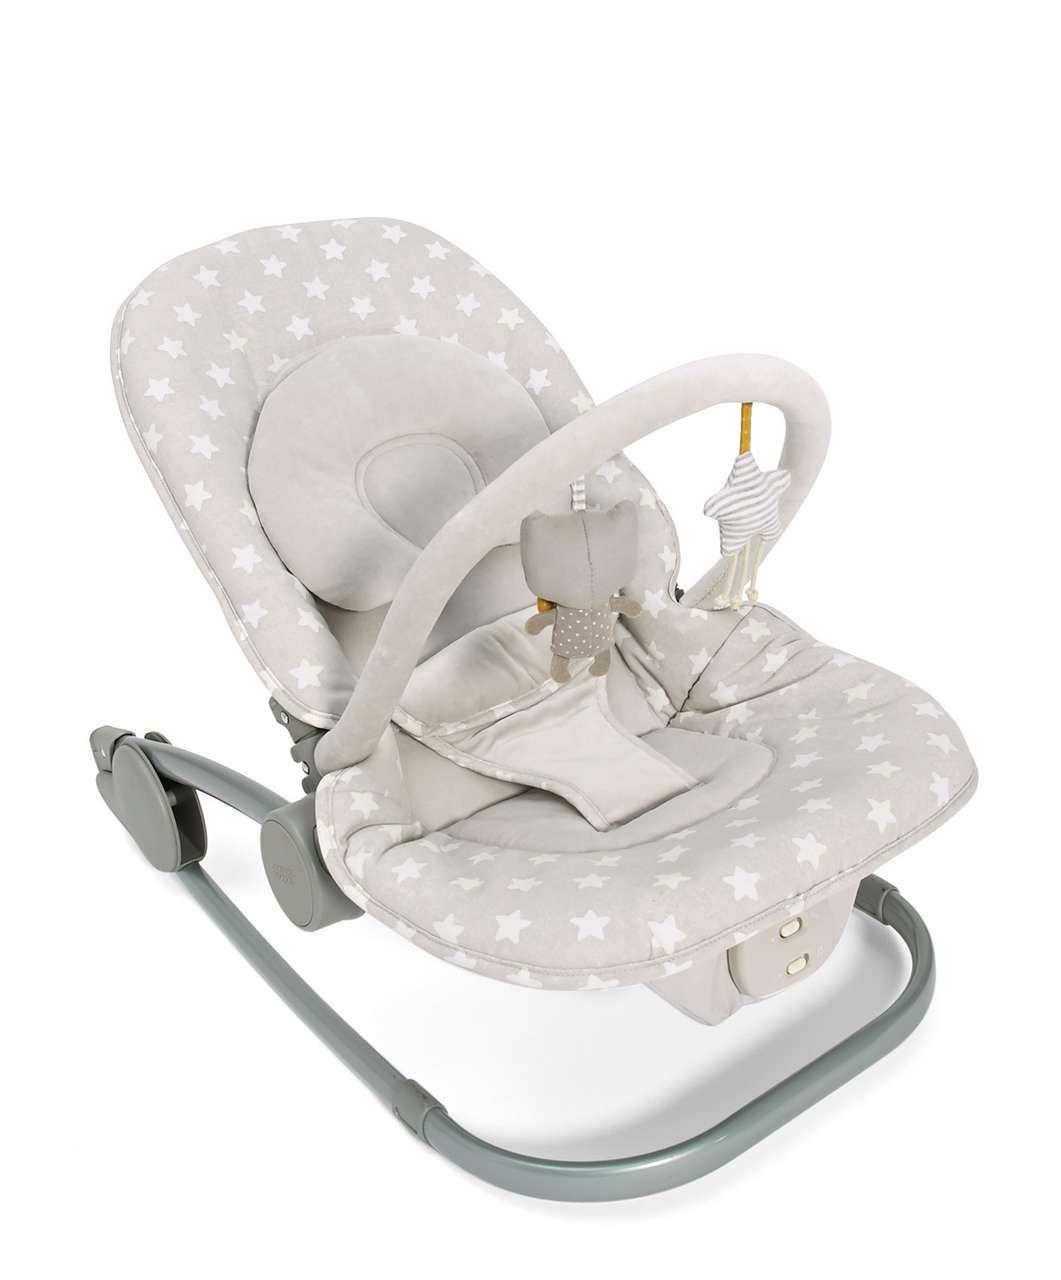 95f22b62cbd1 Baby bouncer - Mama and Papas